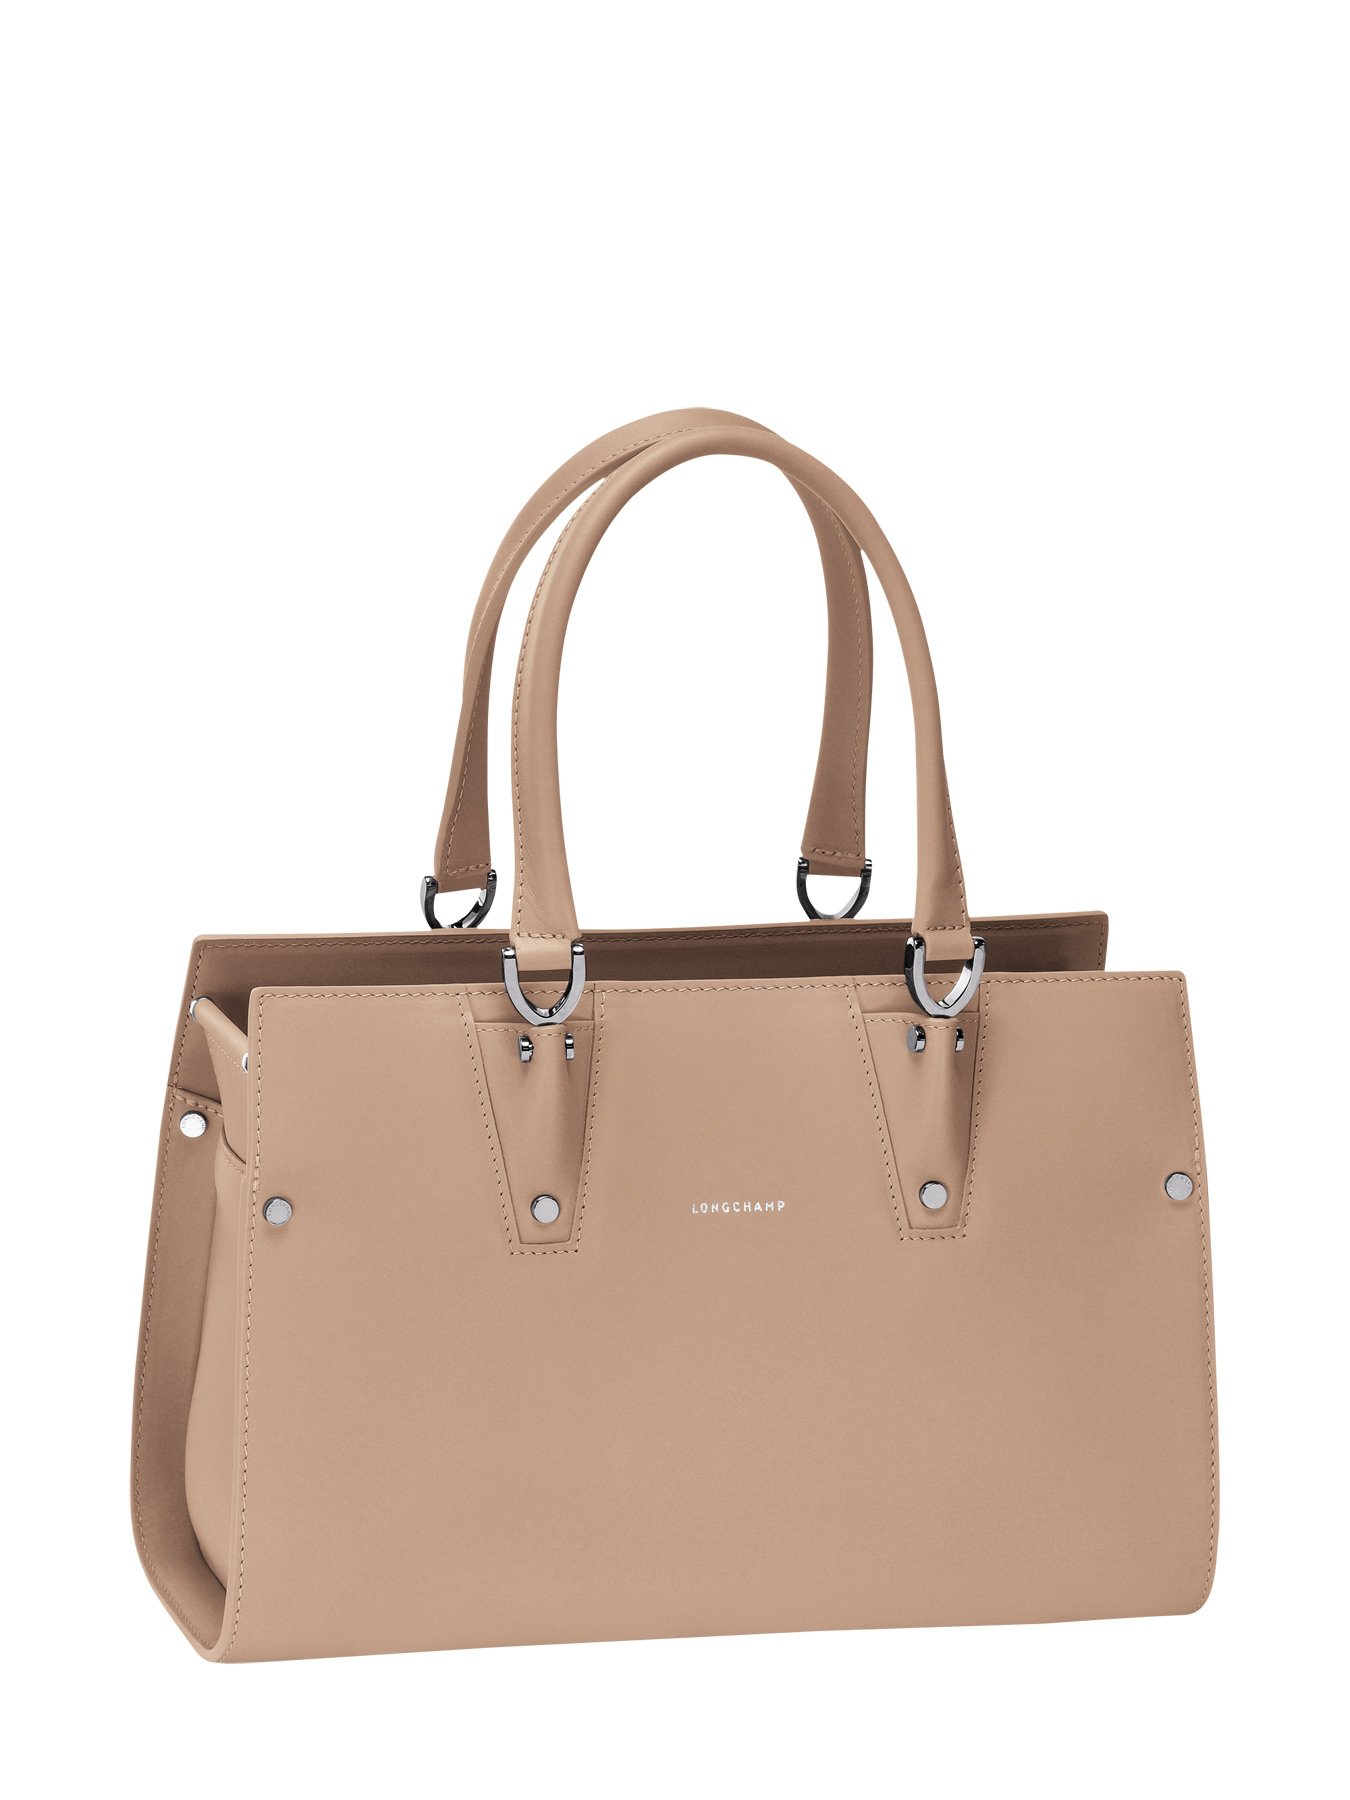 Longchamp Handbag 1320870 Free Shipping Available